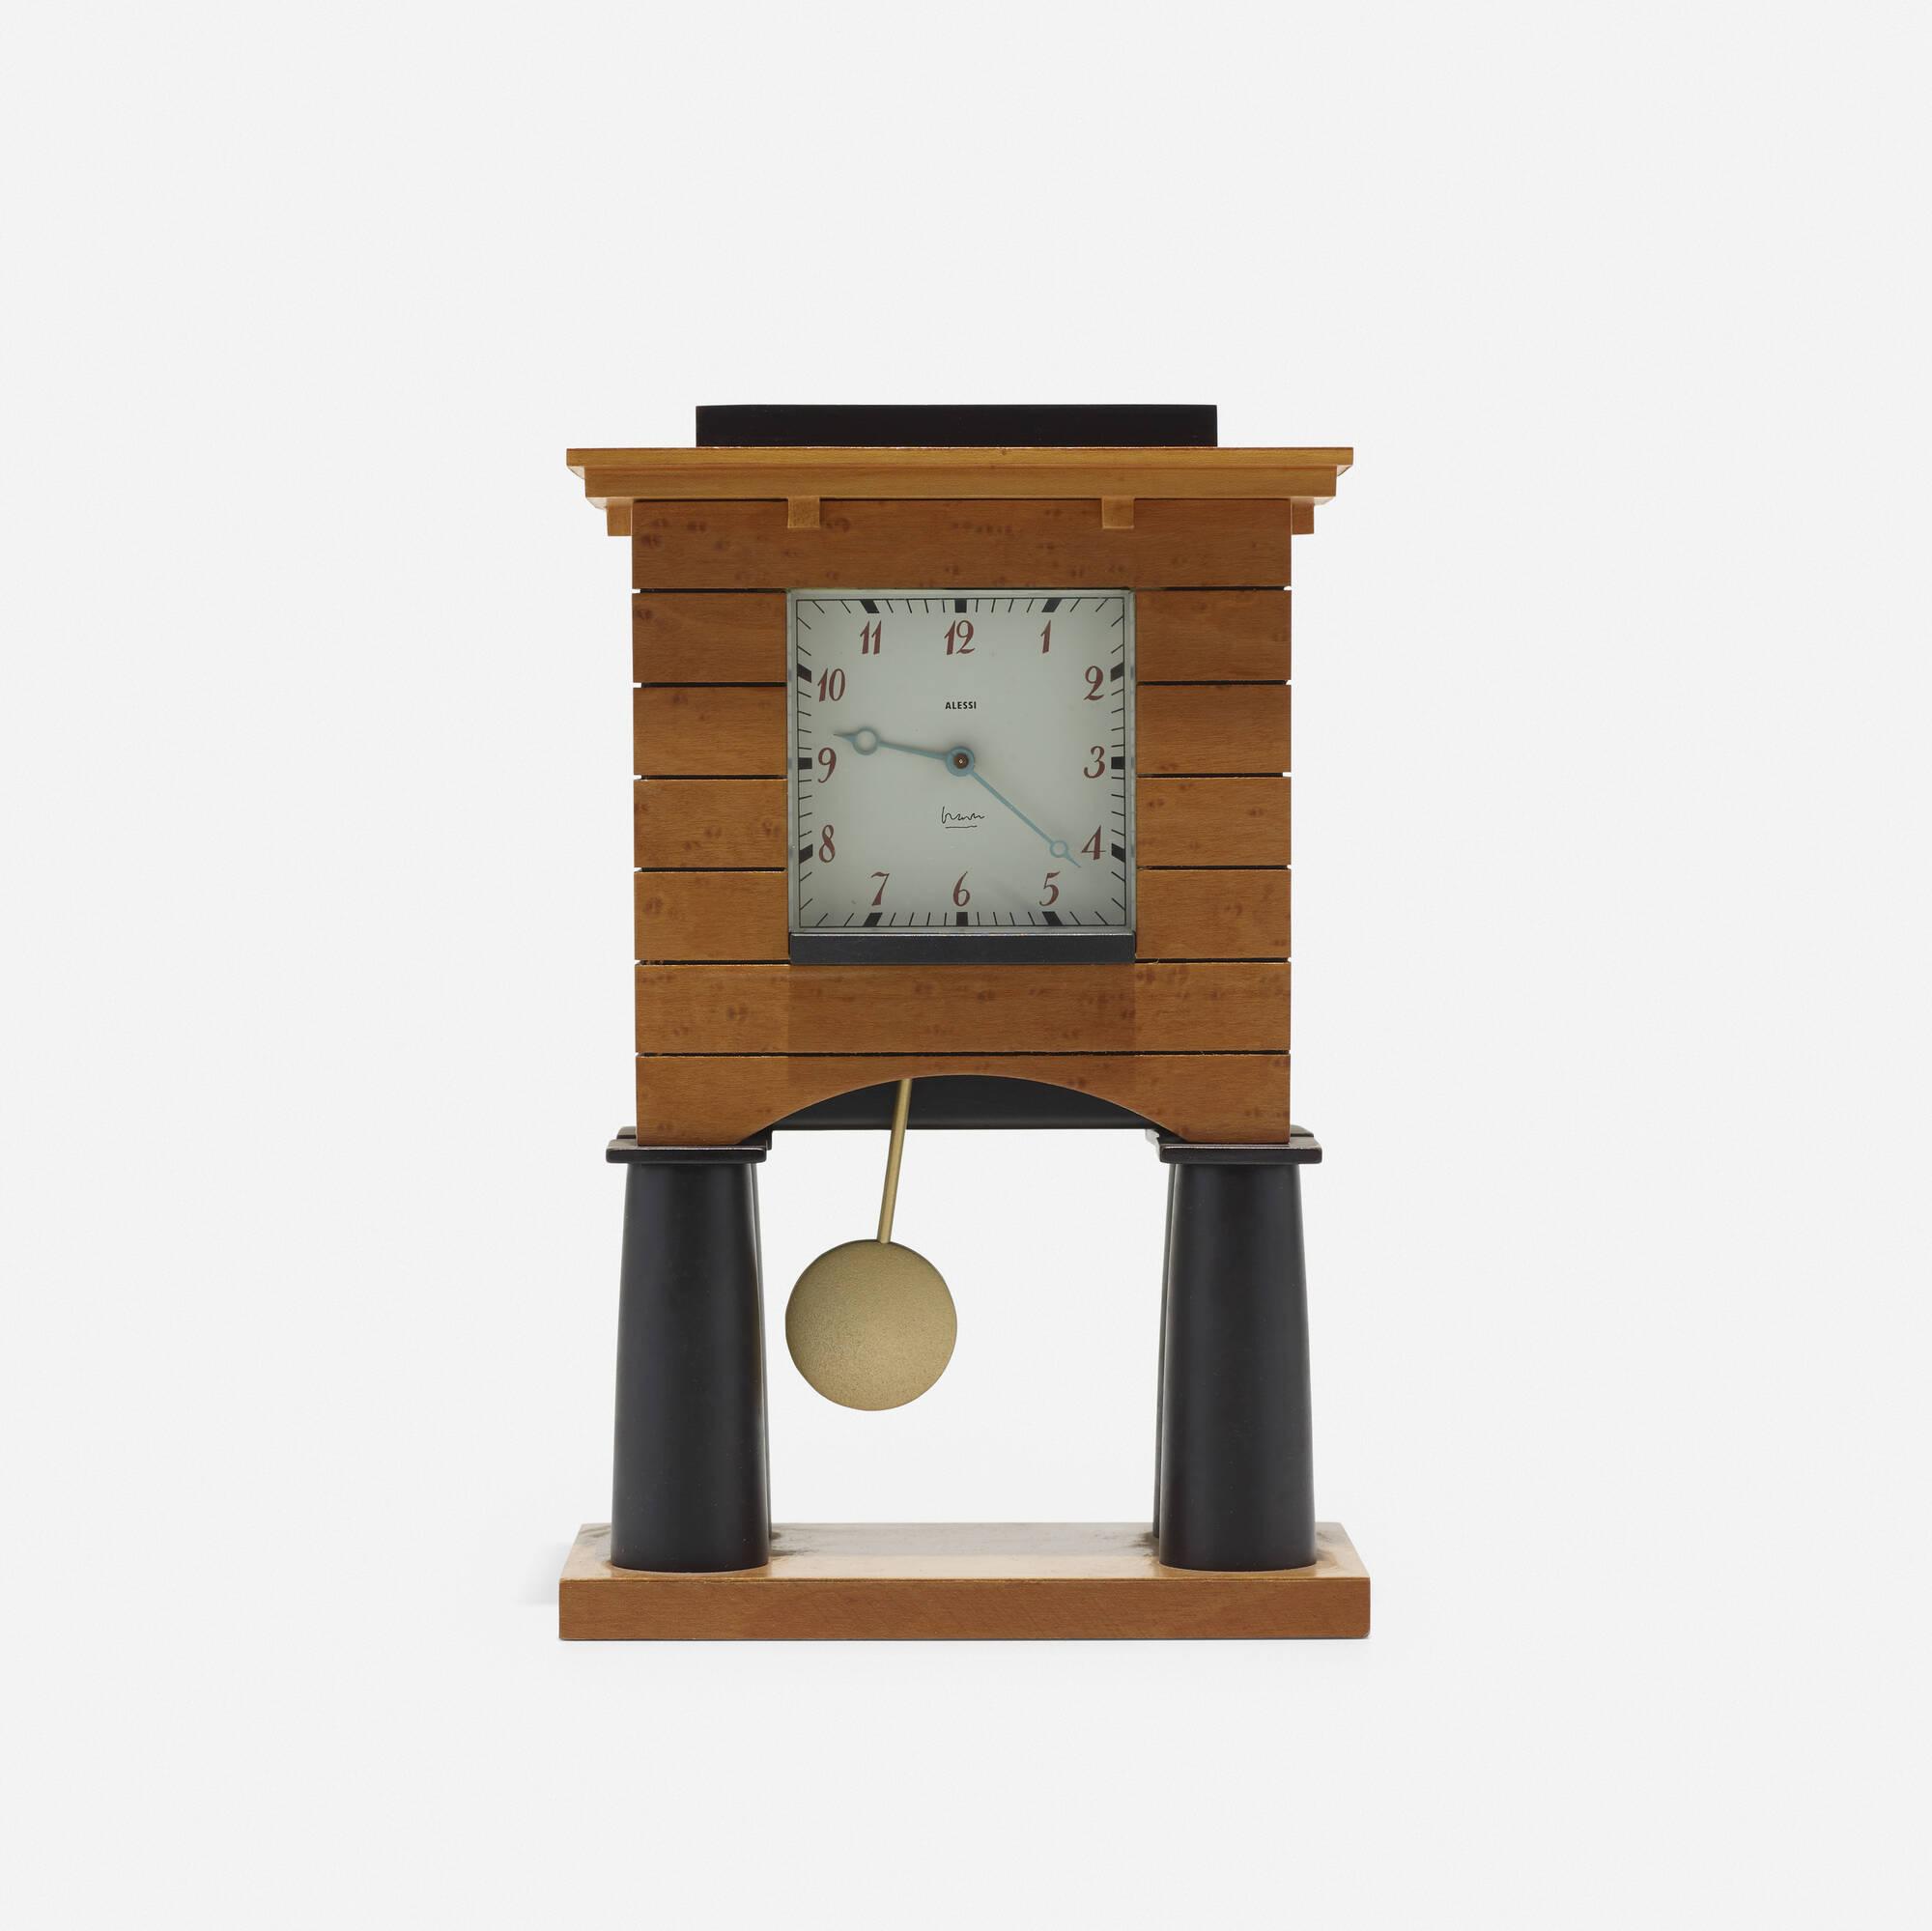 276: Michael Graves / Mantle Clock (1 of 3)